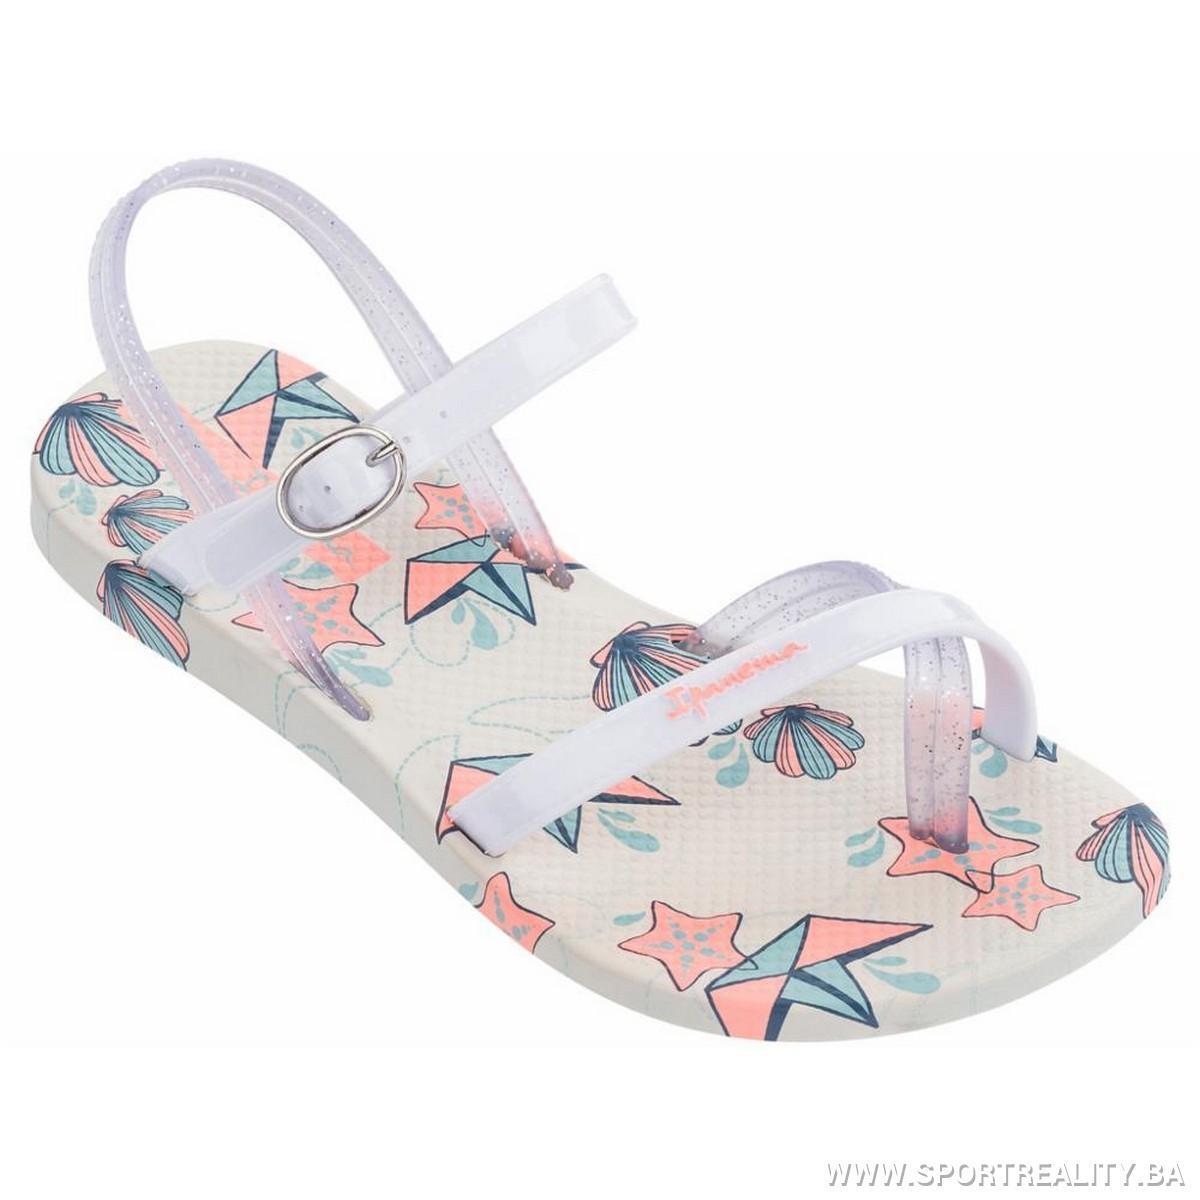 Оригинал Сандалии Детские для девочки 82292-21010 Ipanema Fashion Sandal V Kids Baige/White